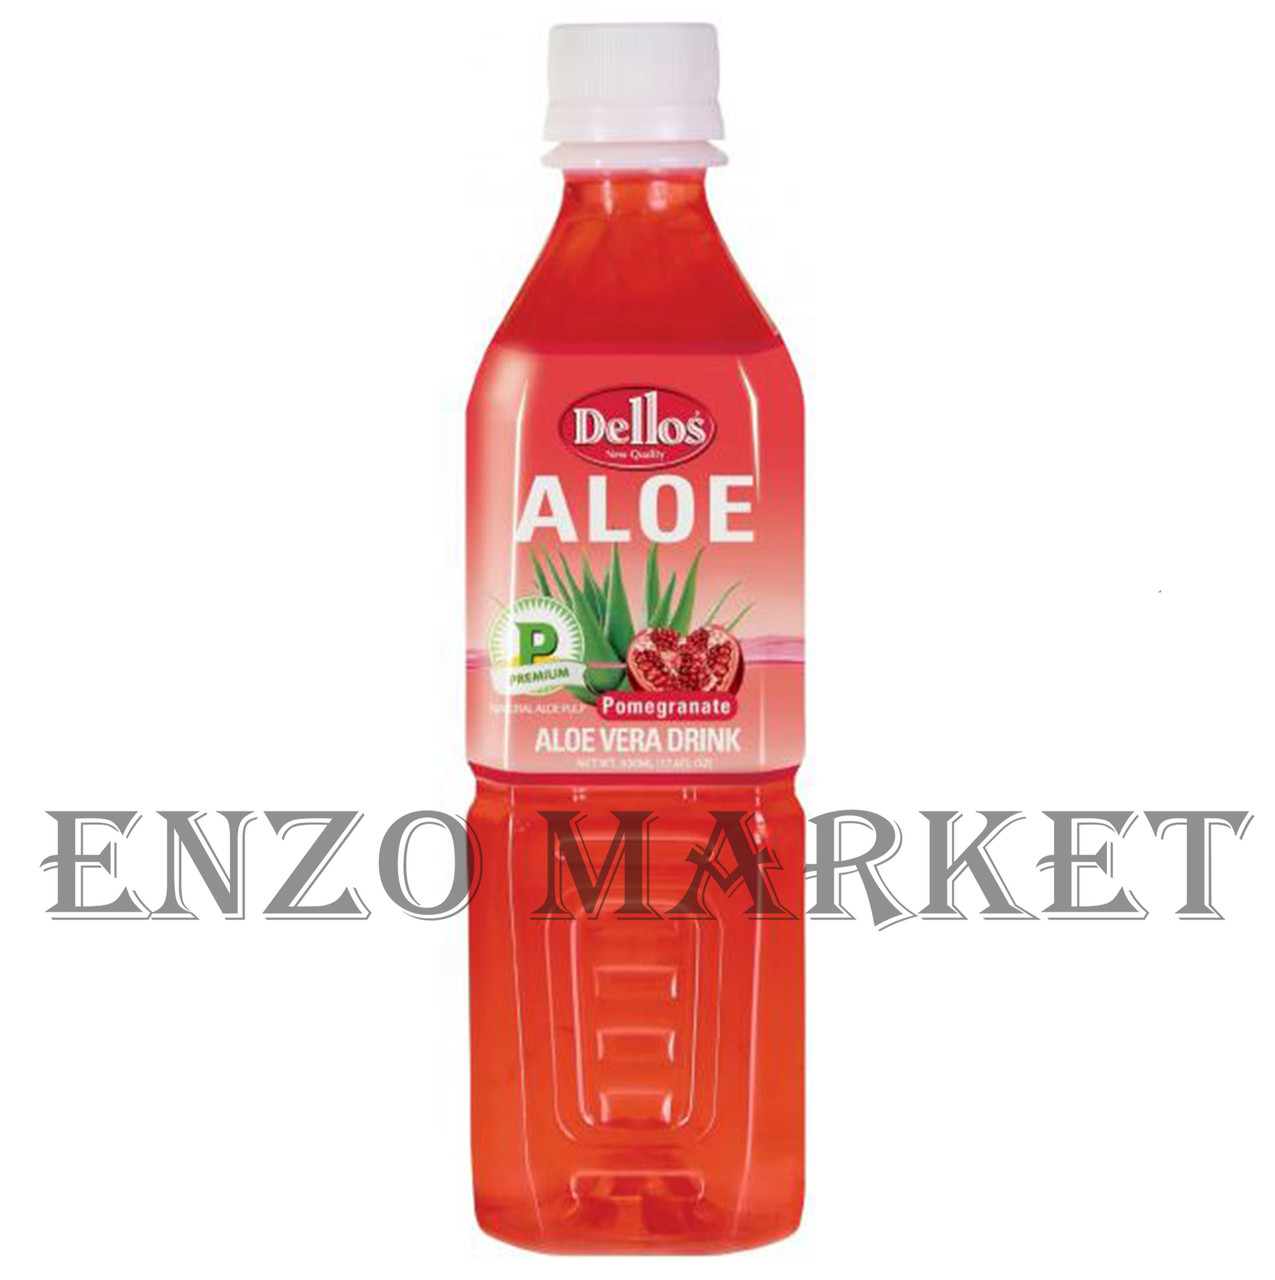 Напиток Aloe Vera Drink Pomegranatel Dellos (алоэ+гранат), 0,5 литра